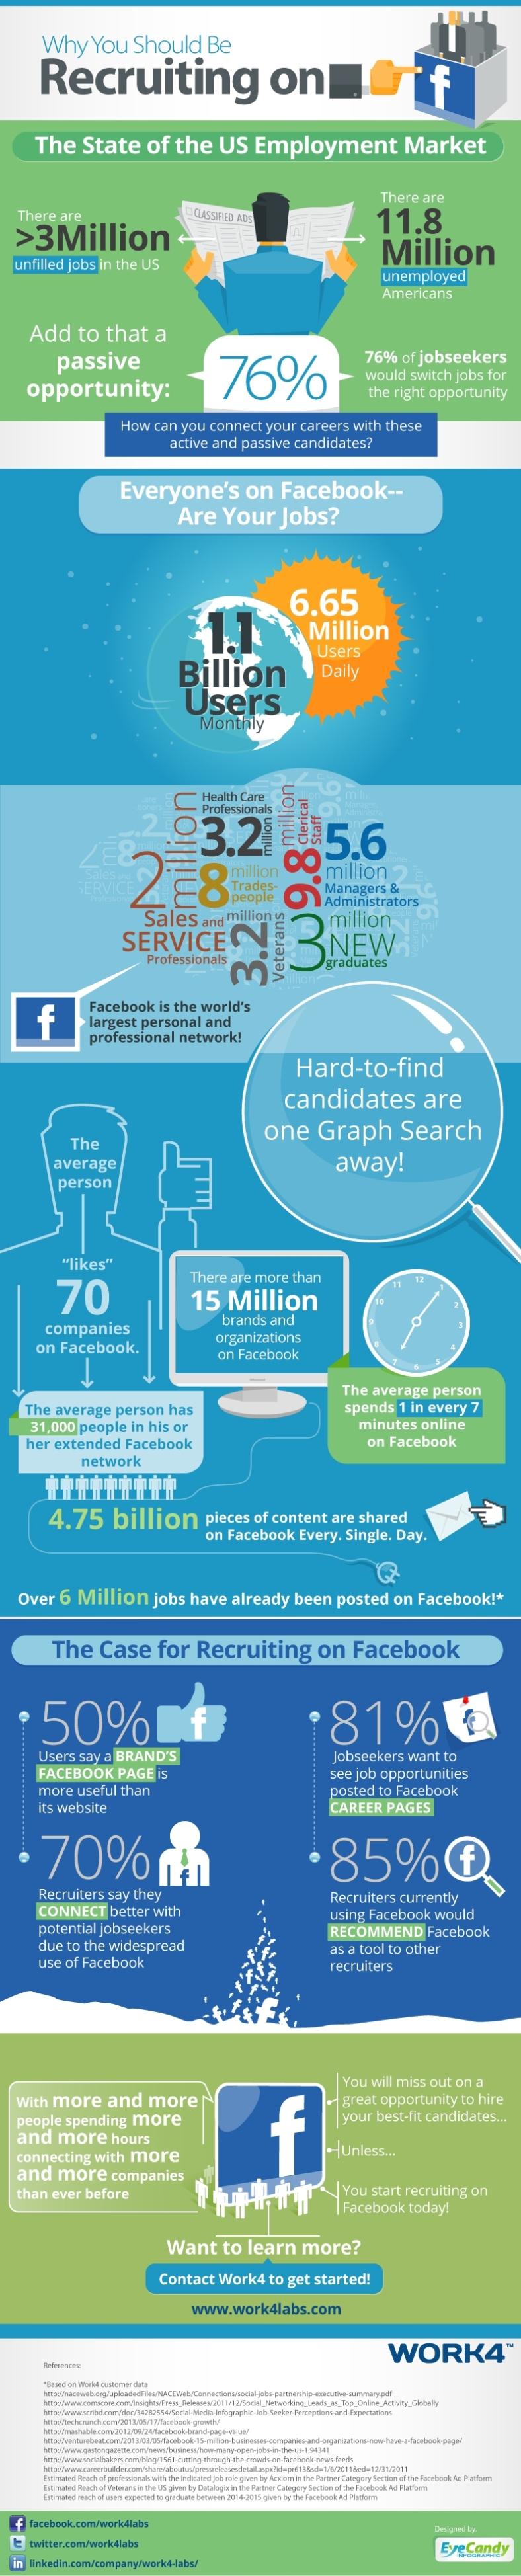 Recruiting-on-Facebook